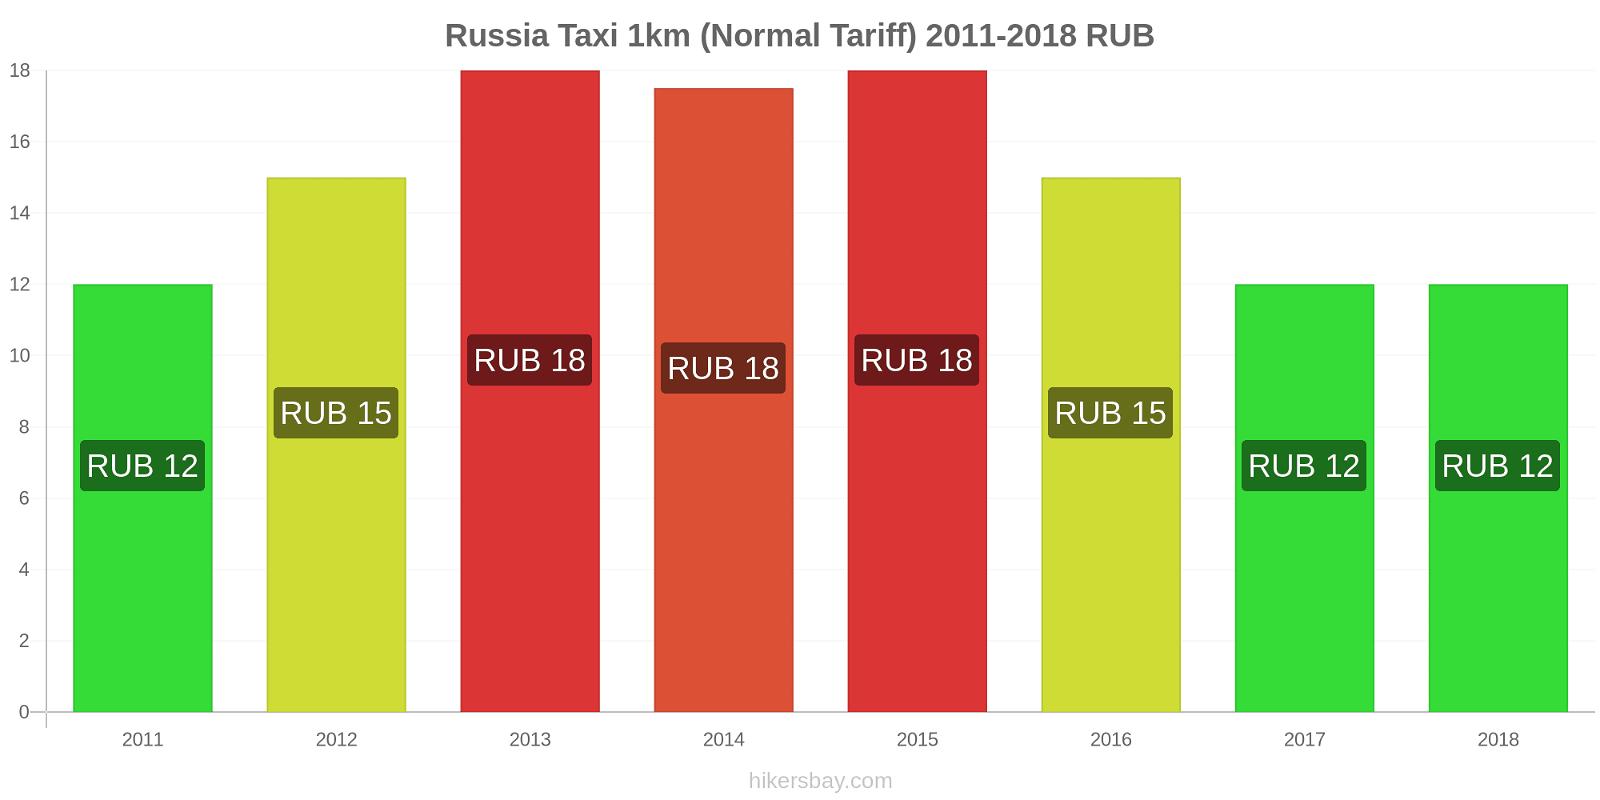 Russia price changes Taxi 1km (Normal Tariff) hikersbay.com